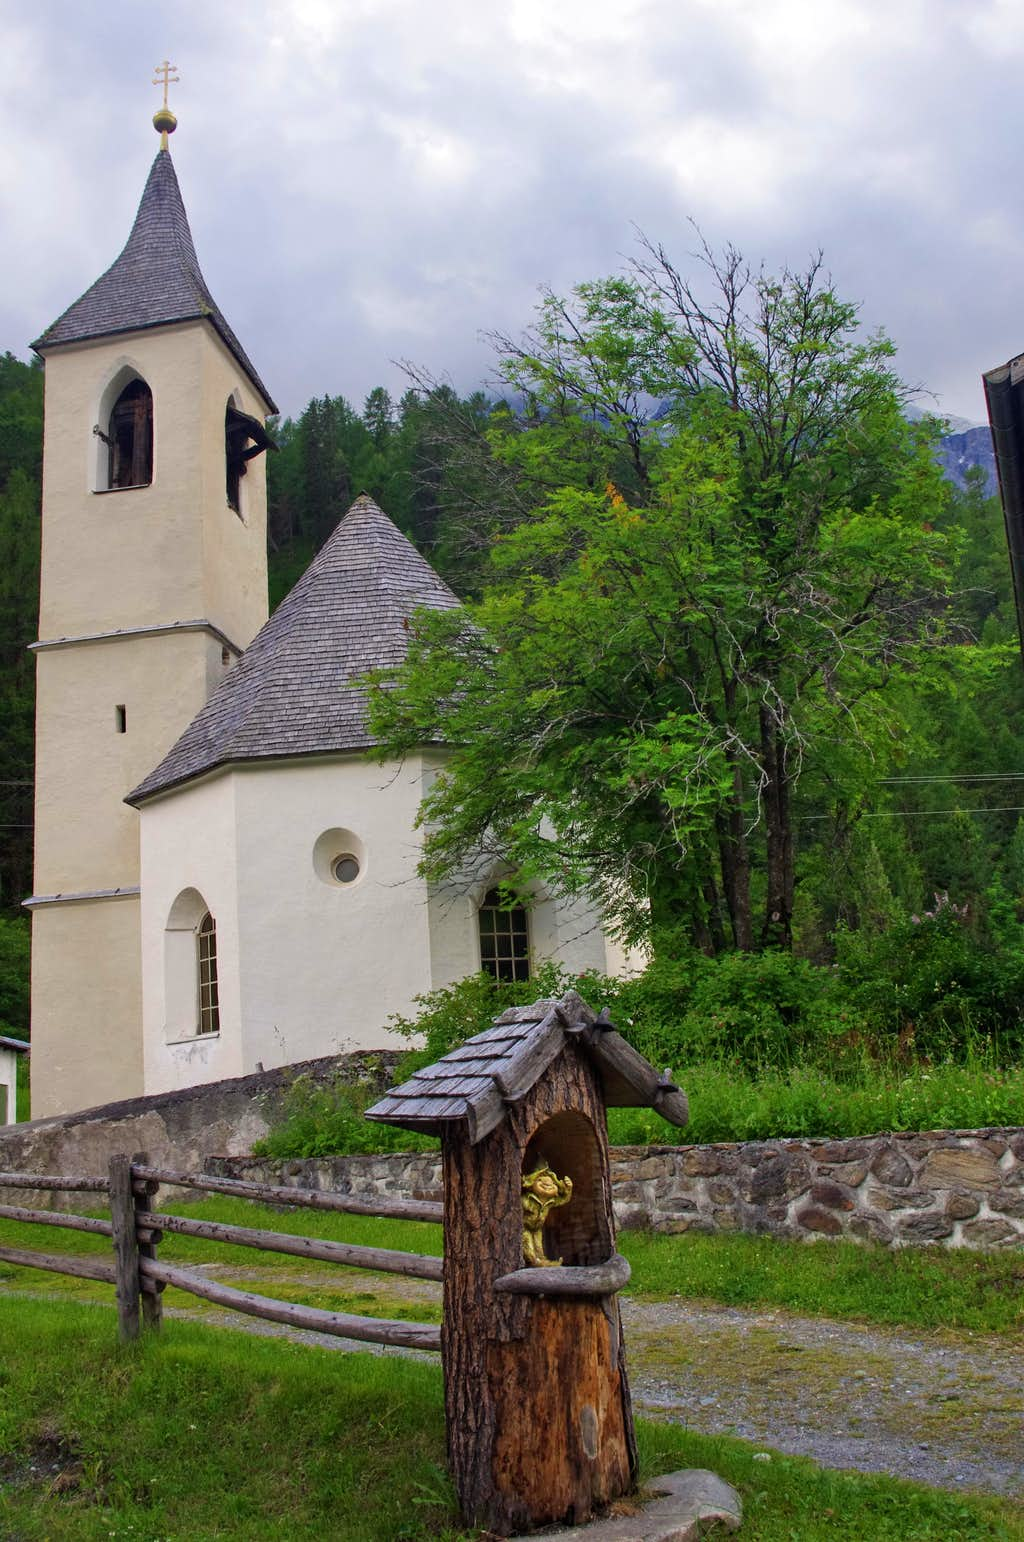 The old parish church of Solda/Sulden